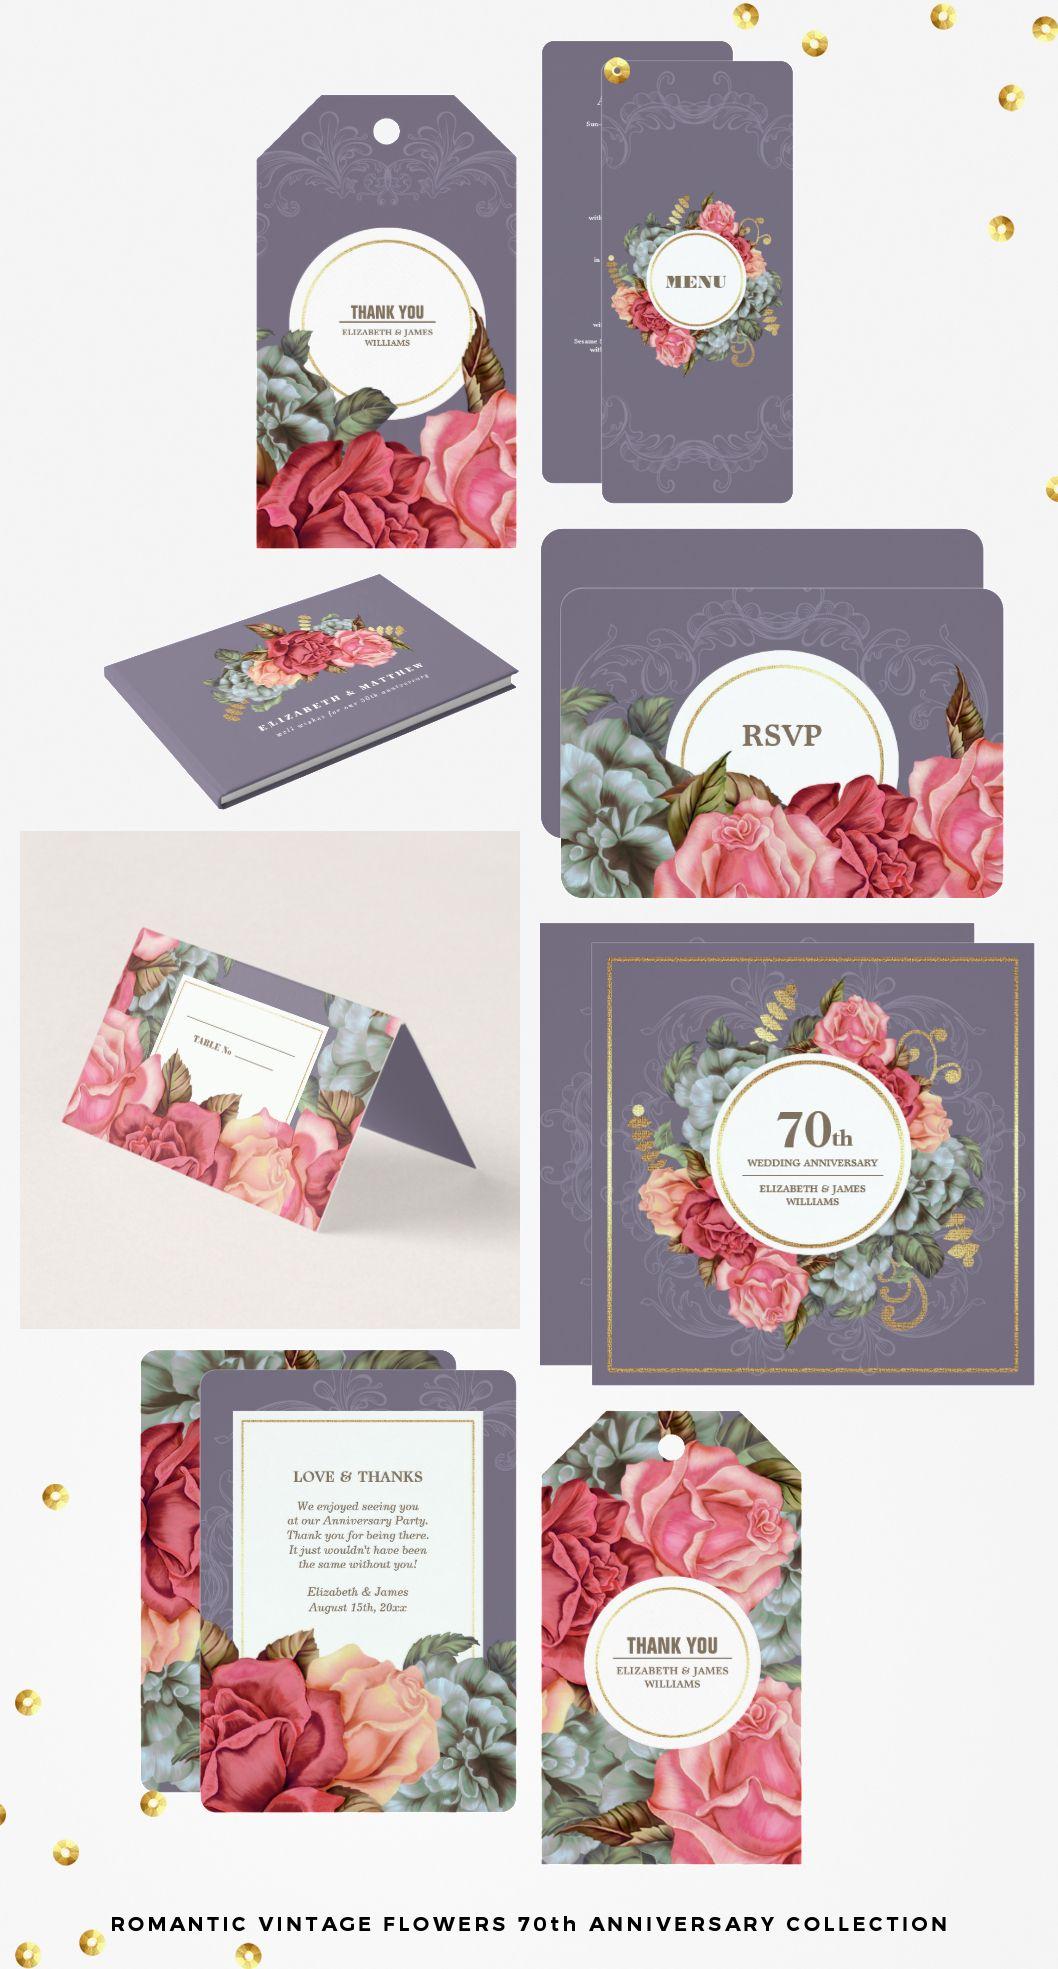 ROMANTIC VINTAGE FLOWERS DESIGN 70TH WEDDING ANNIVERSARY